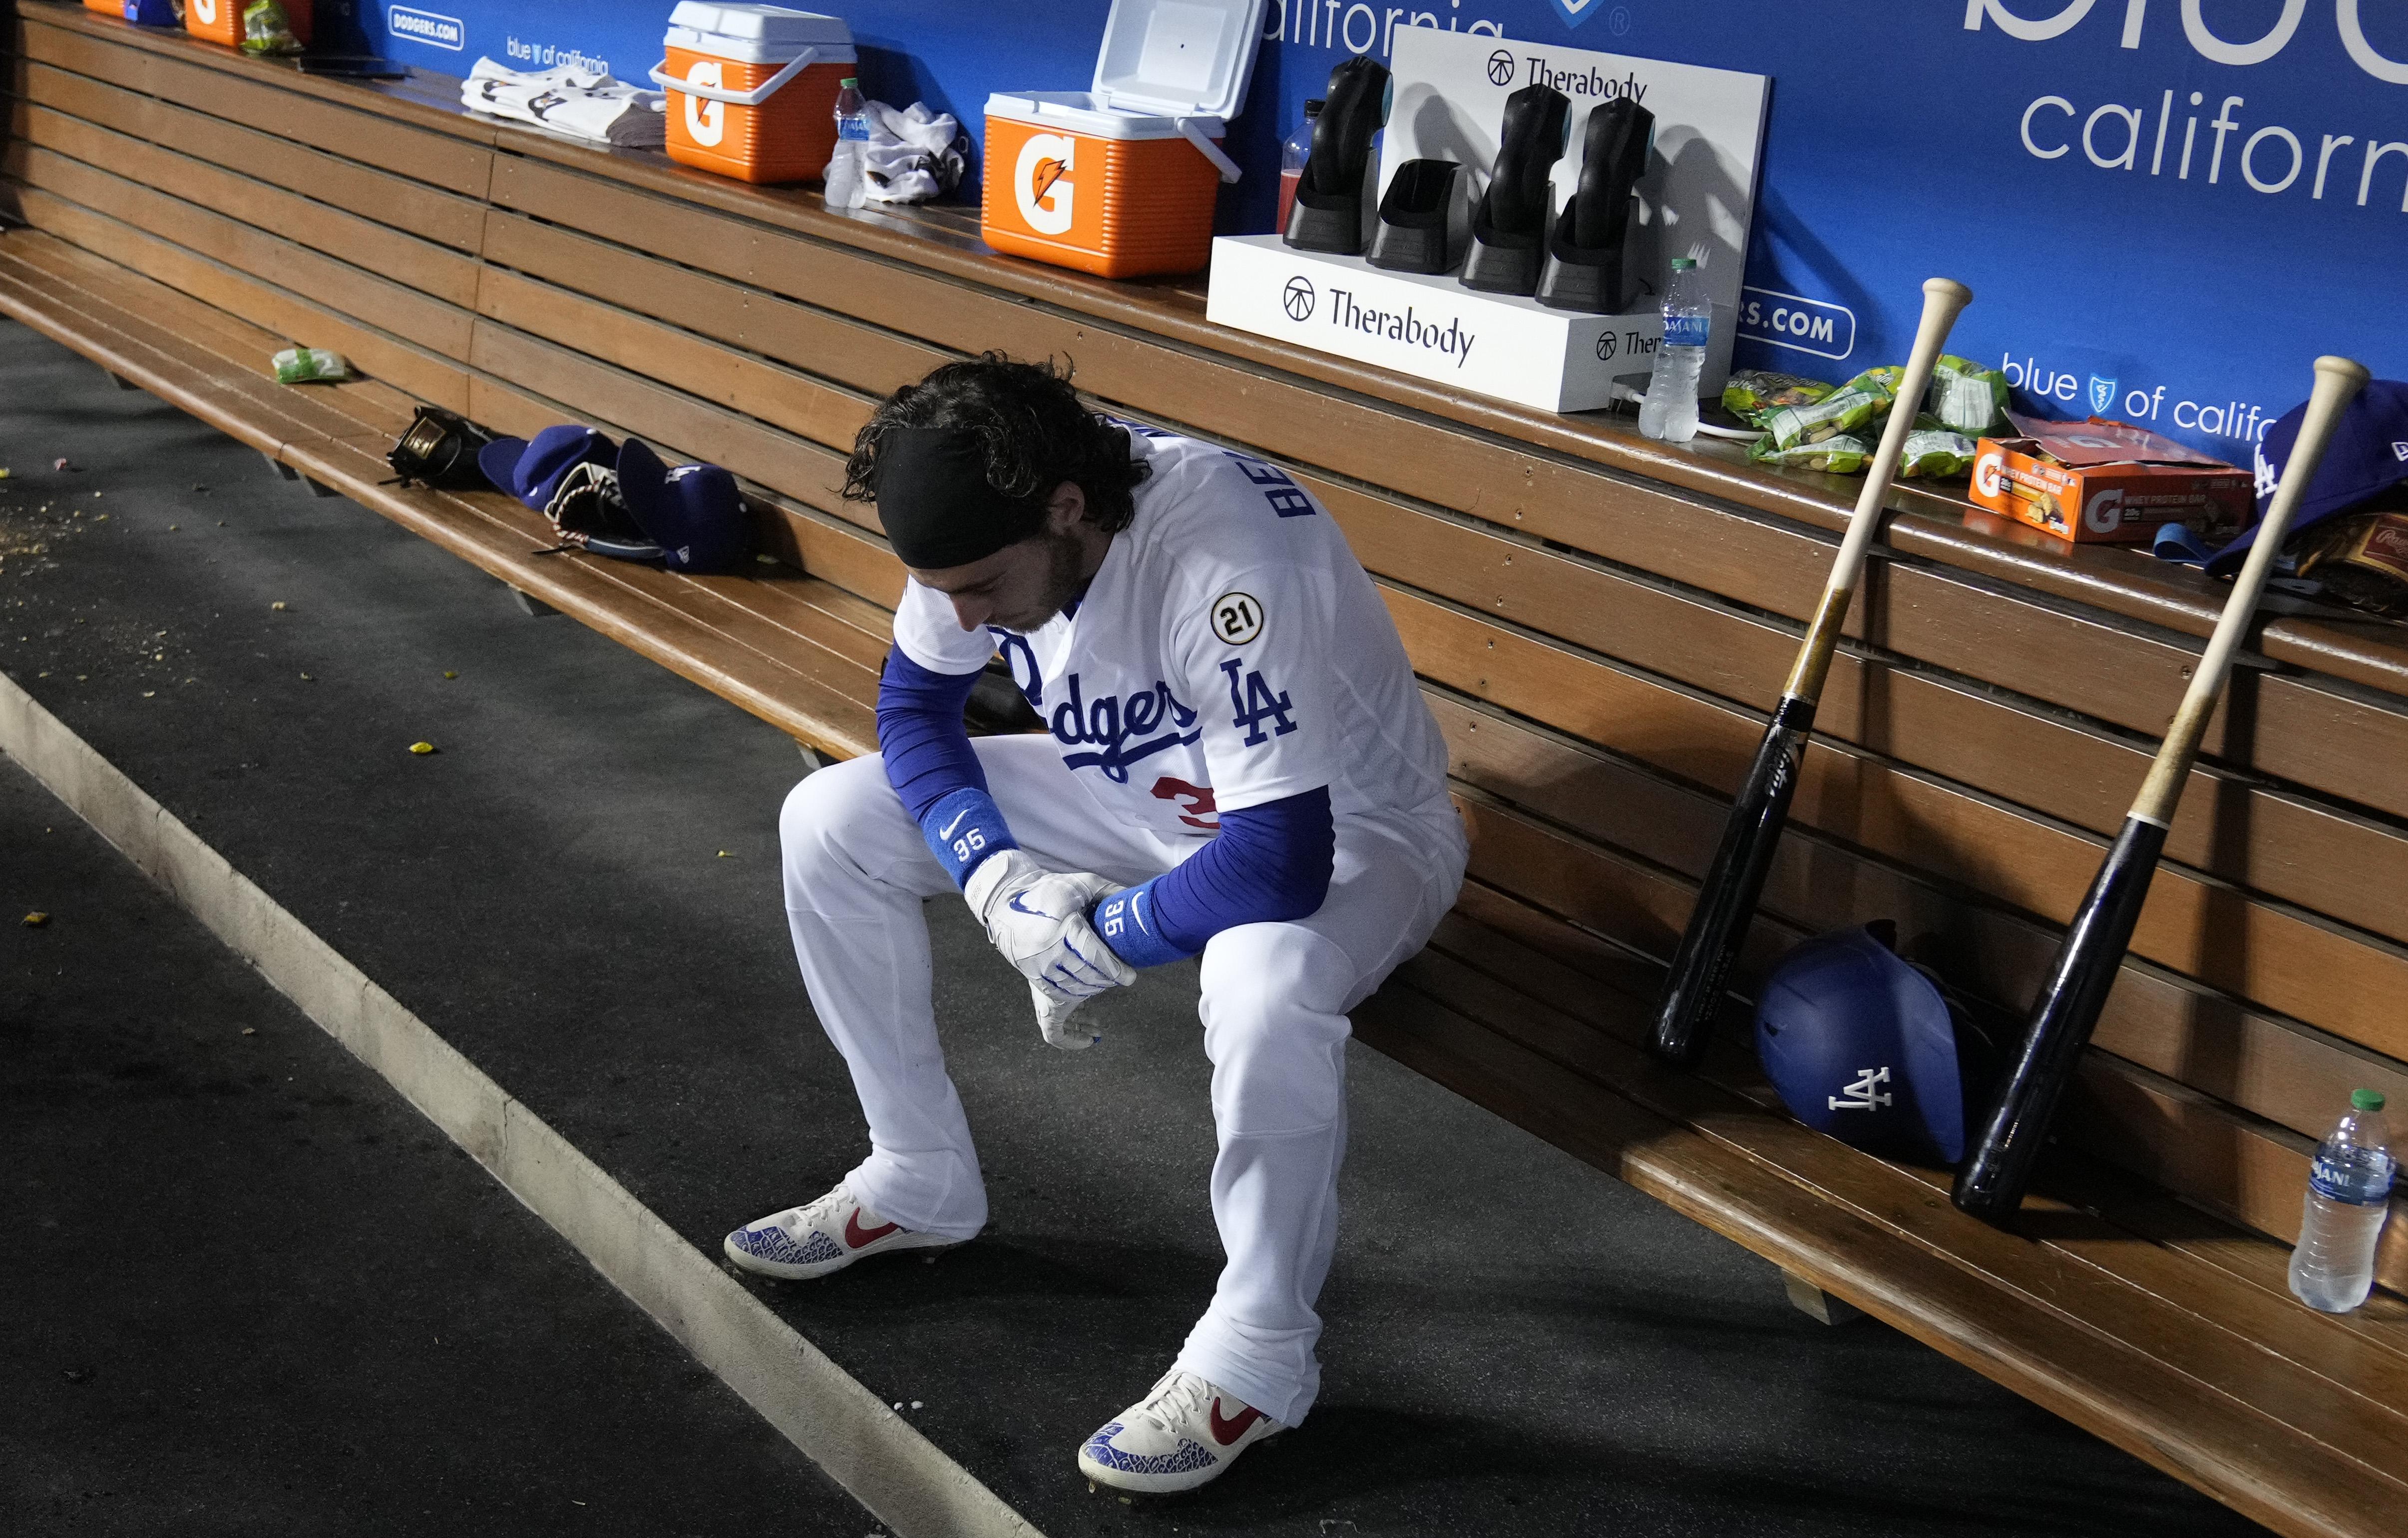 Los Angeles Dodgers defeat the Arizona Diamondbacks 5-3 during a baseball game at Dodger Stadium in Los Angeles.